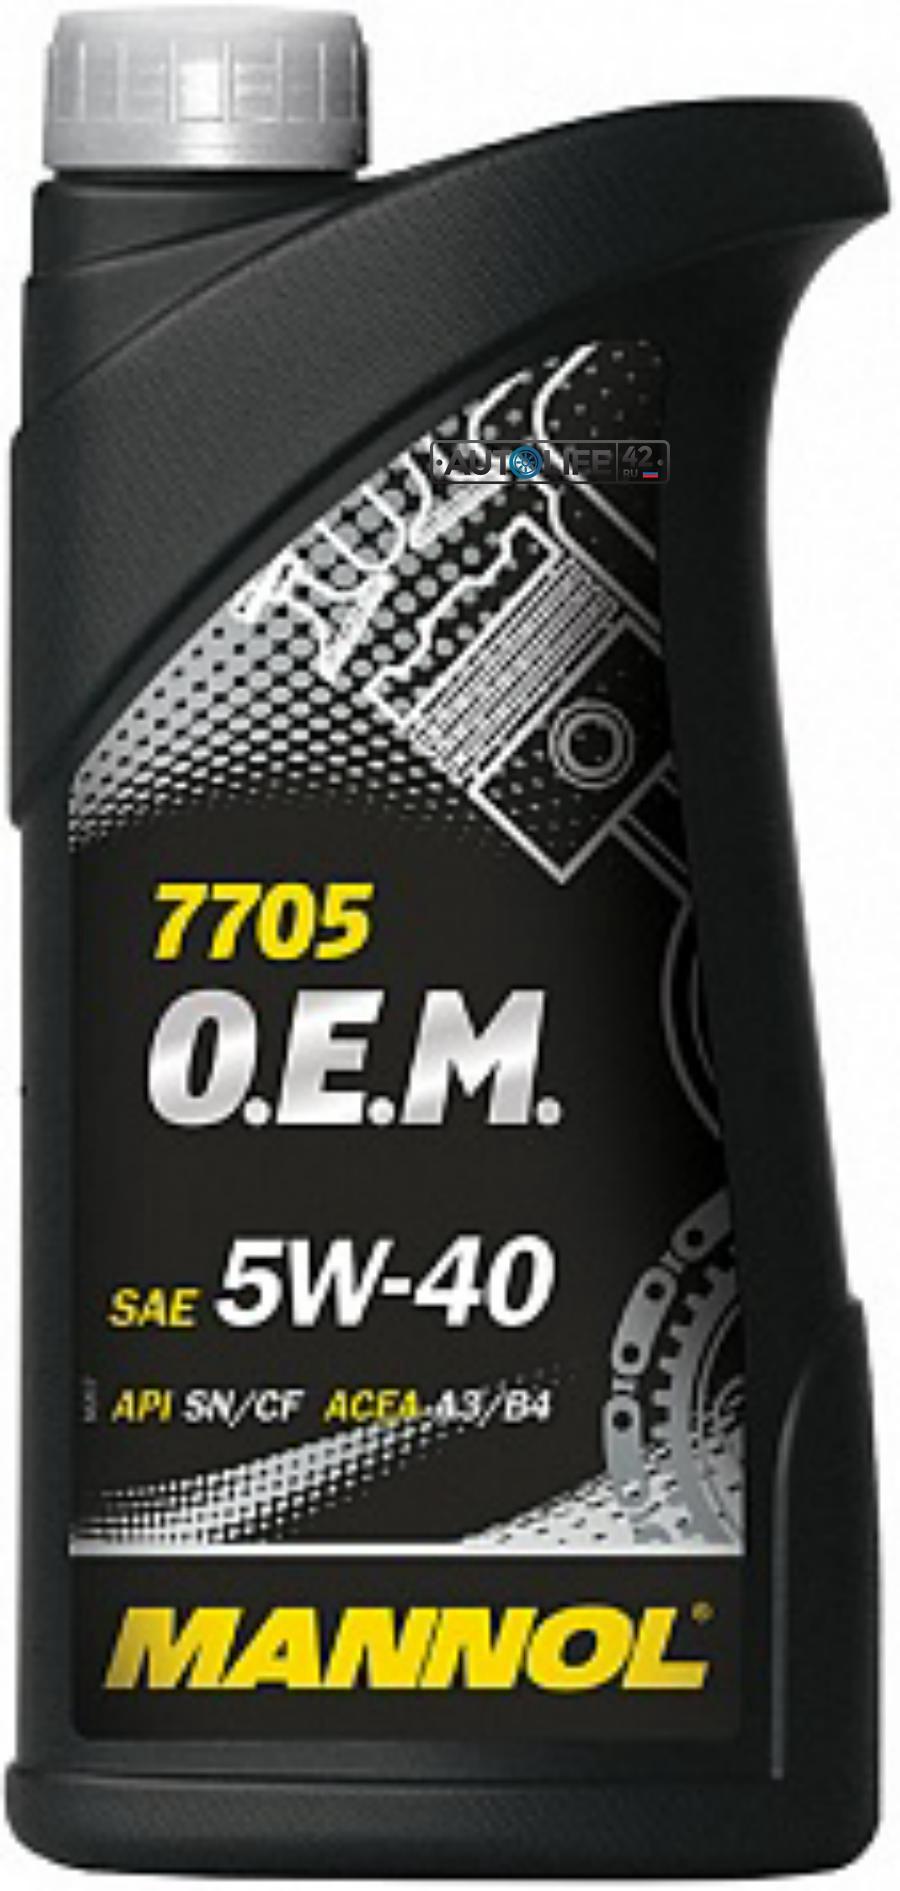 Масло моторное синтетическое 7705 O,E,M, for Renault Nissan 5W-40, 1л